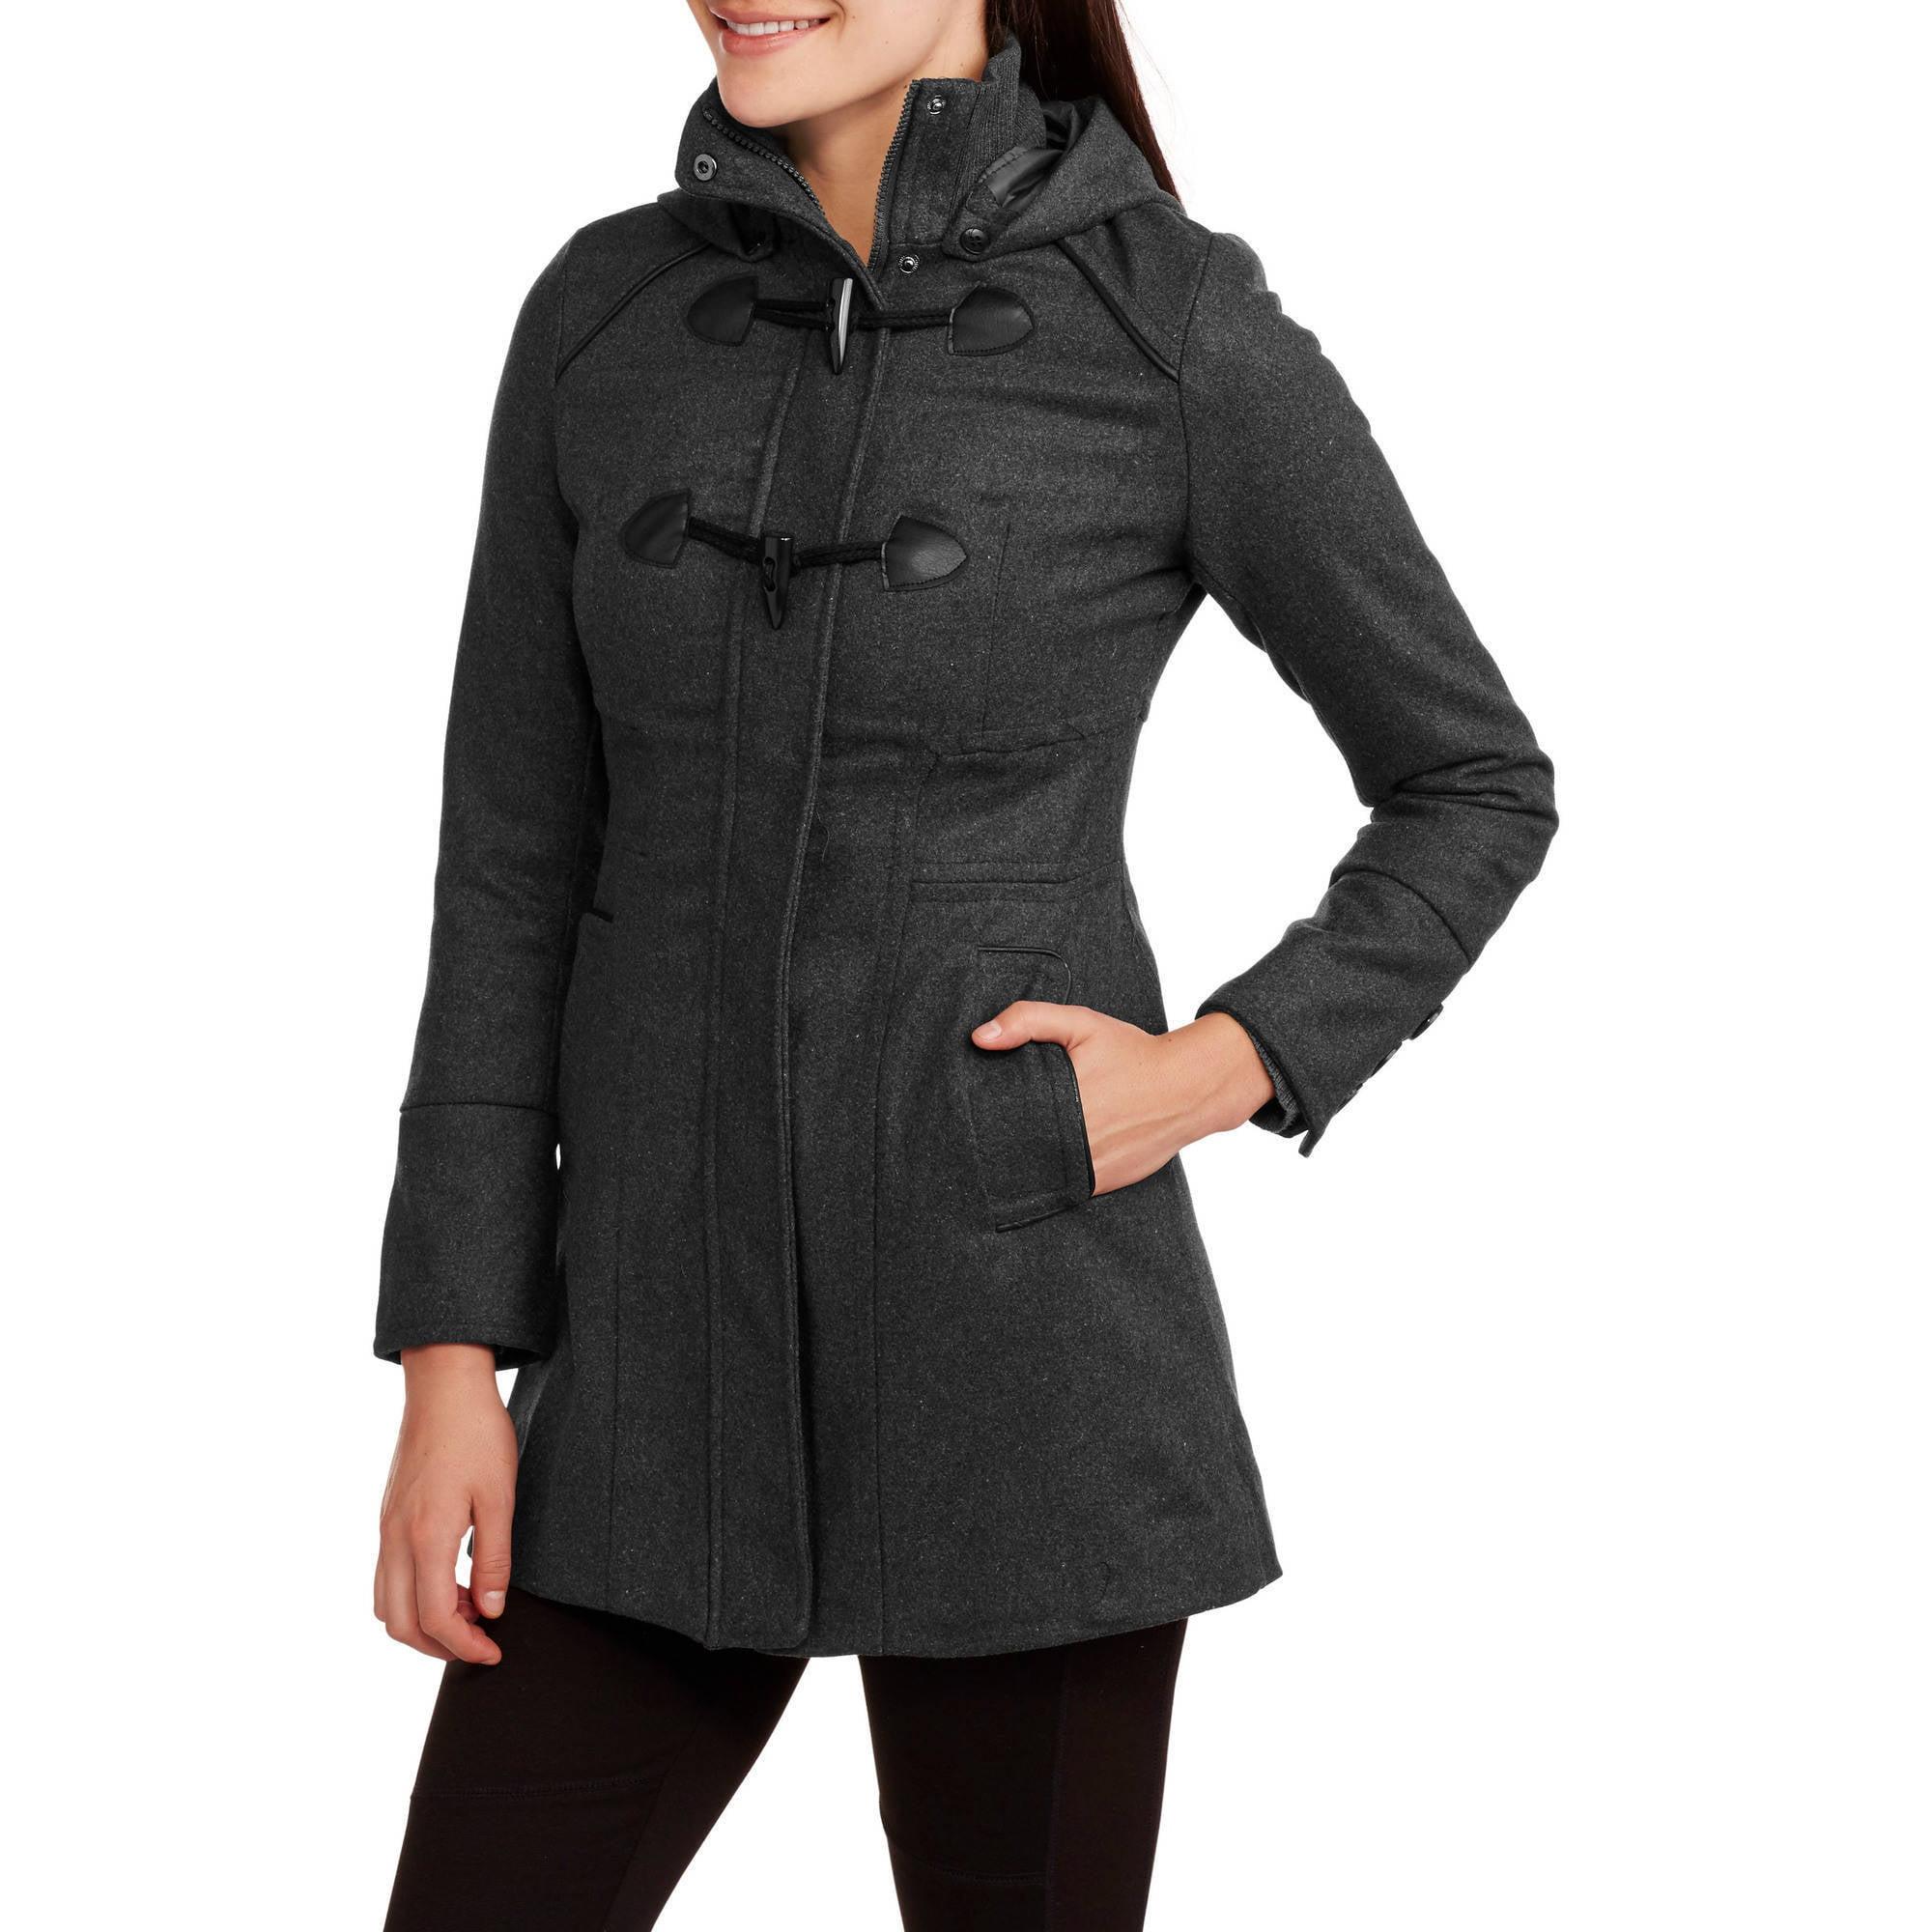 Women's Warm Winter Coats - Walmart.com